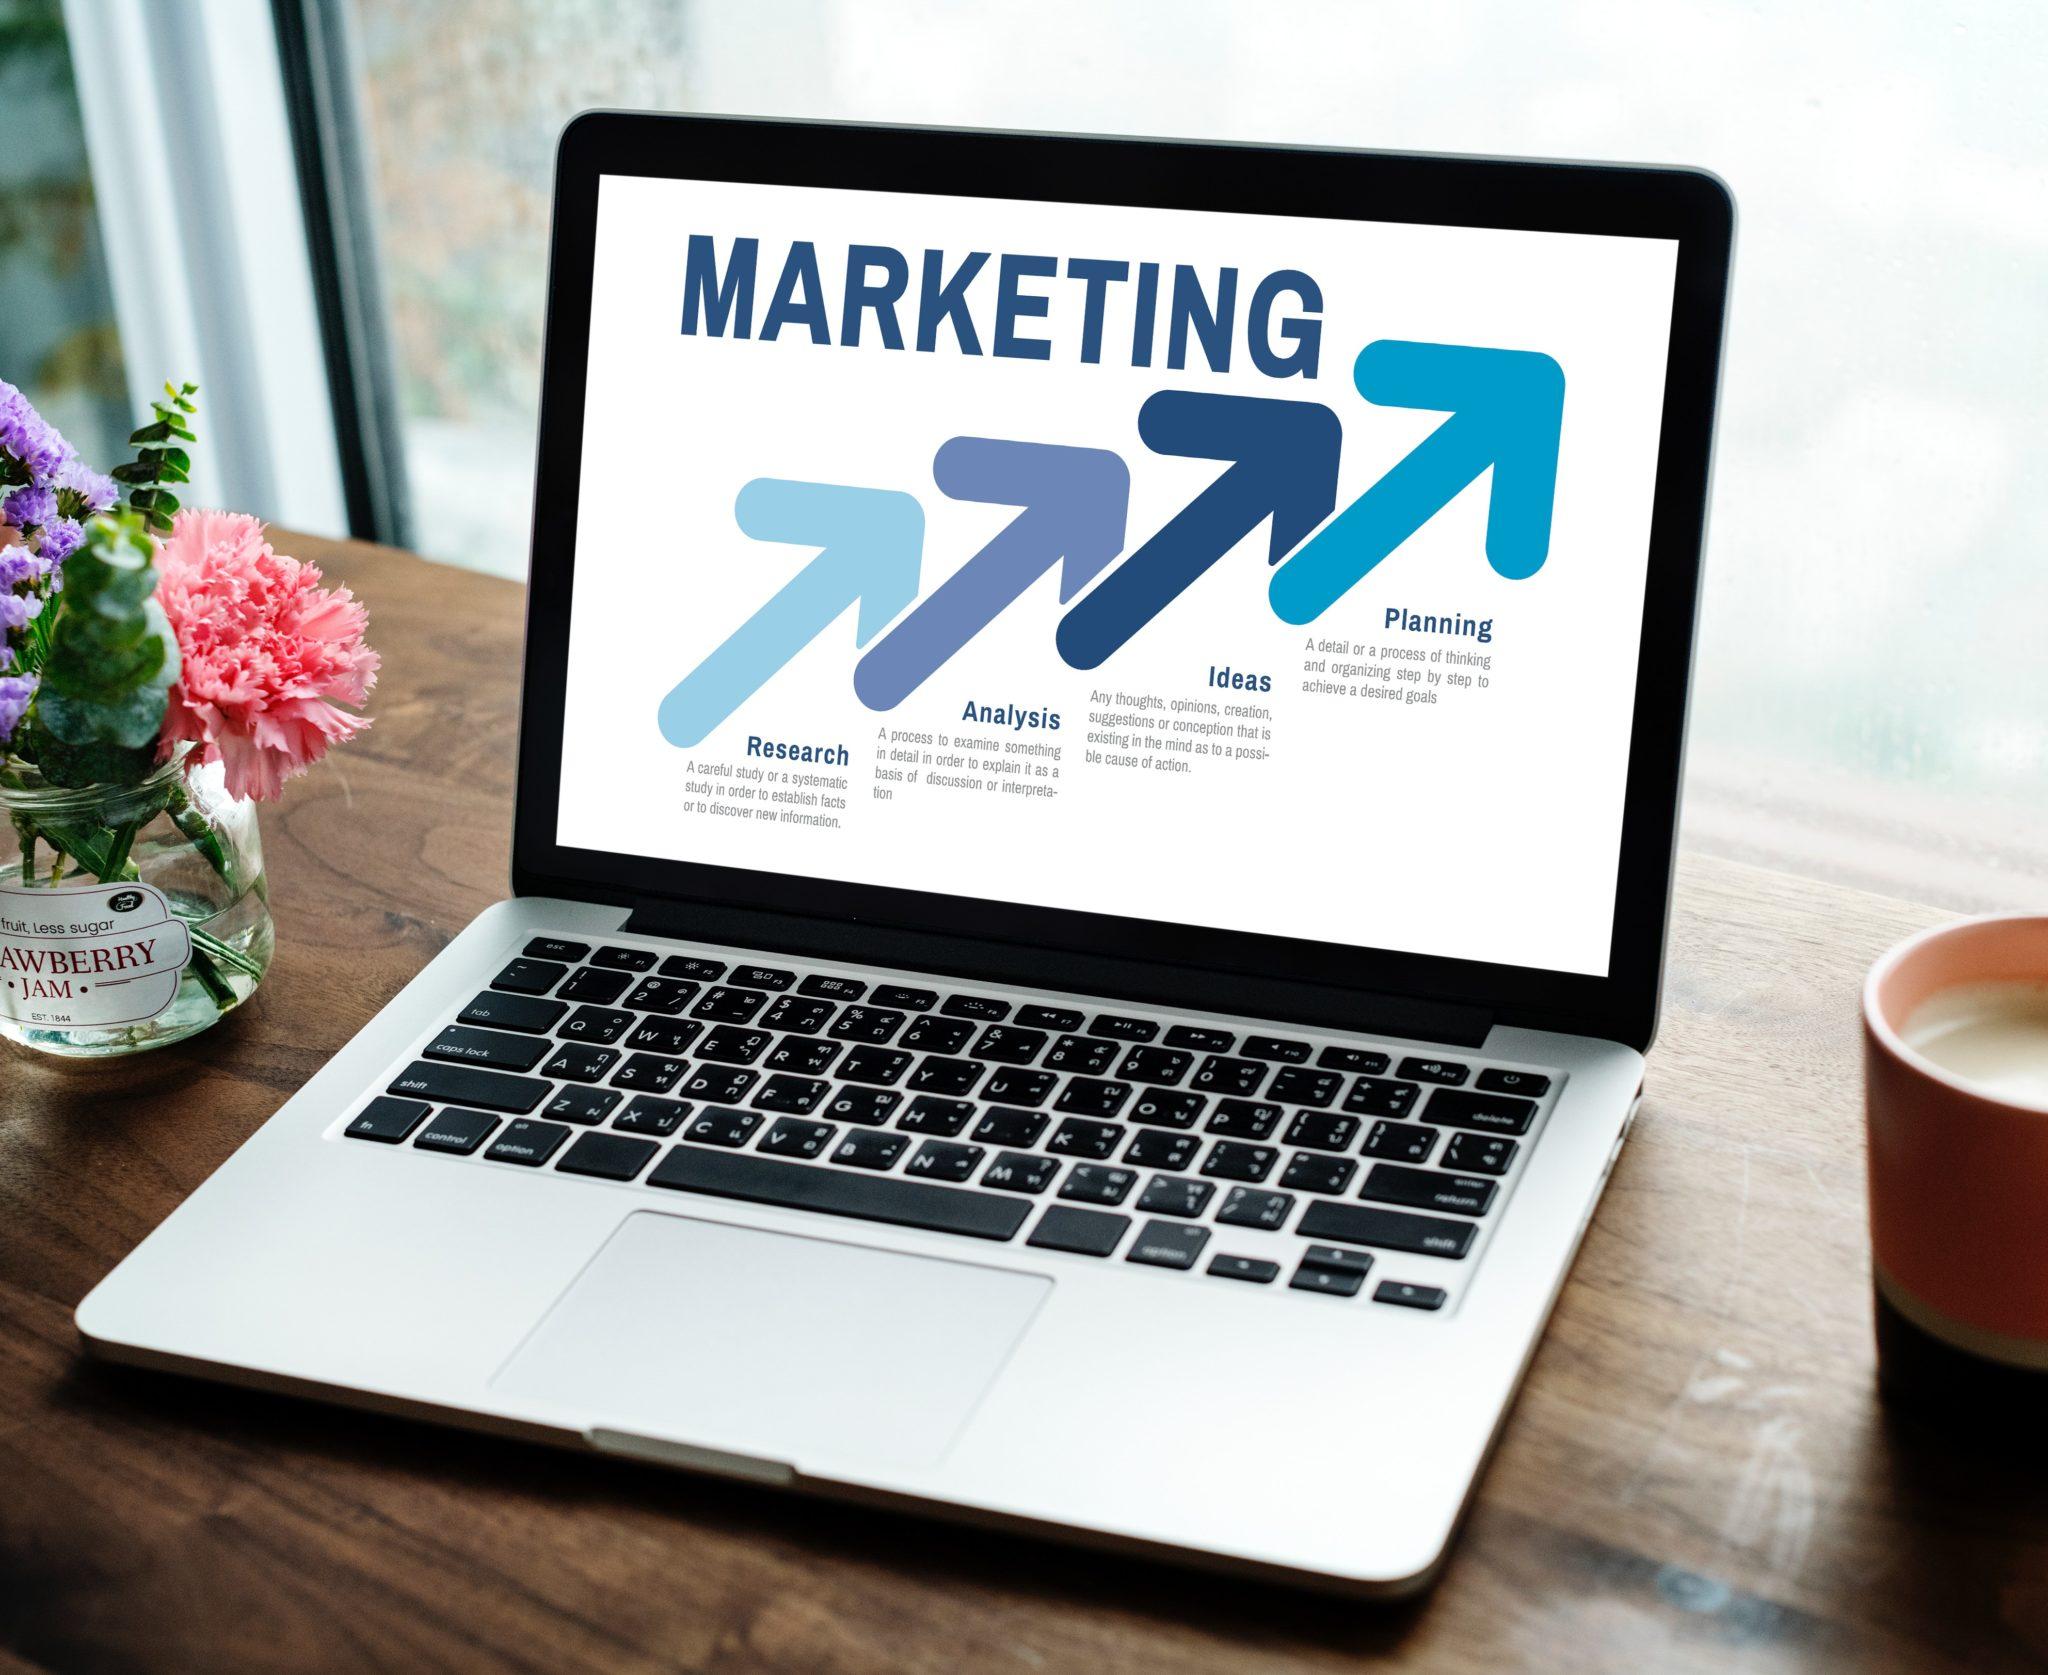 sms-marketing-campaign-ideas